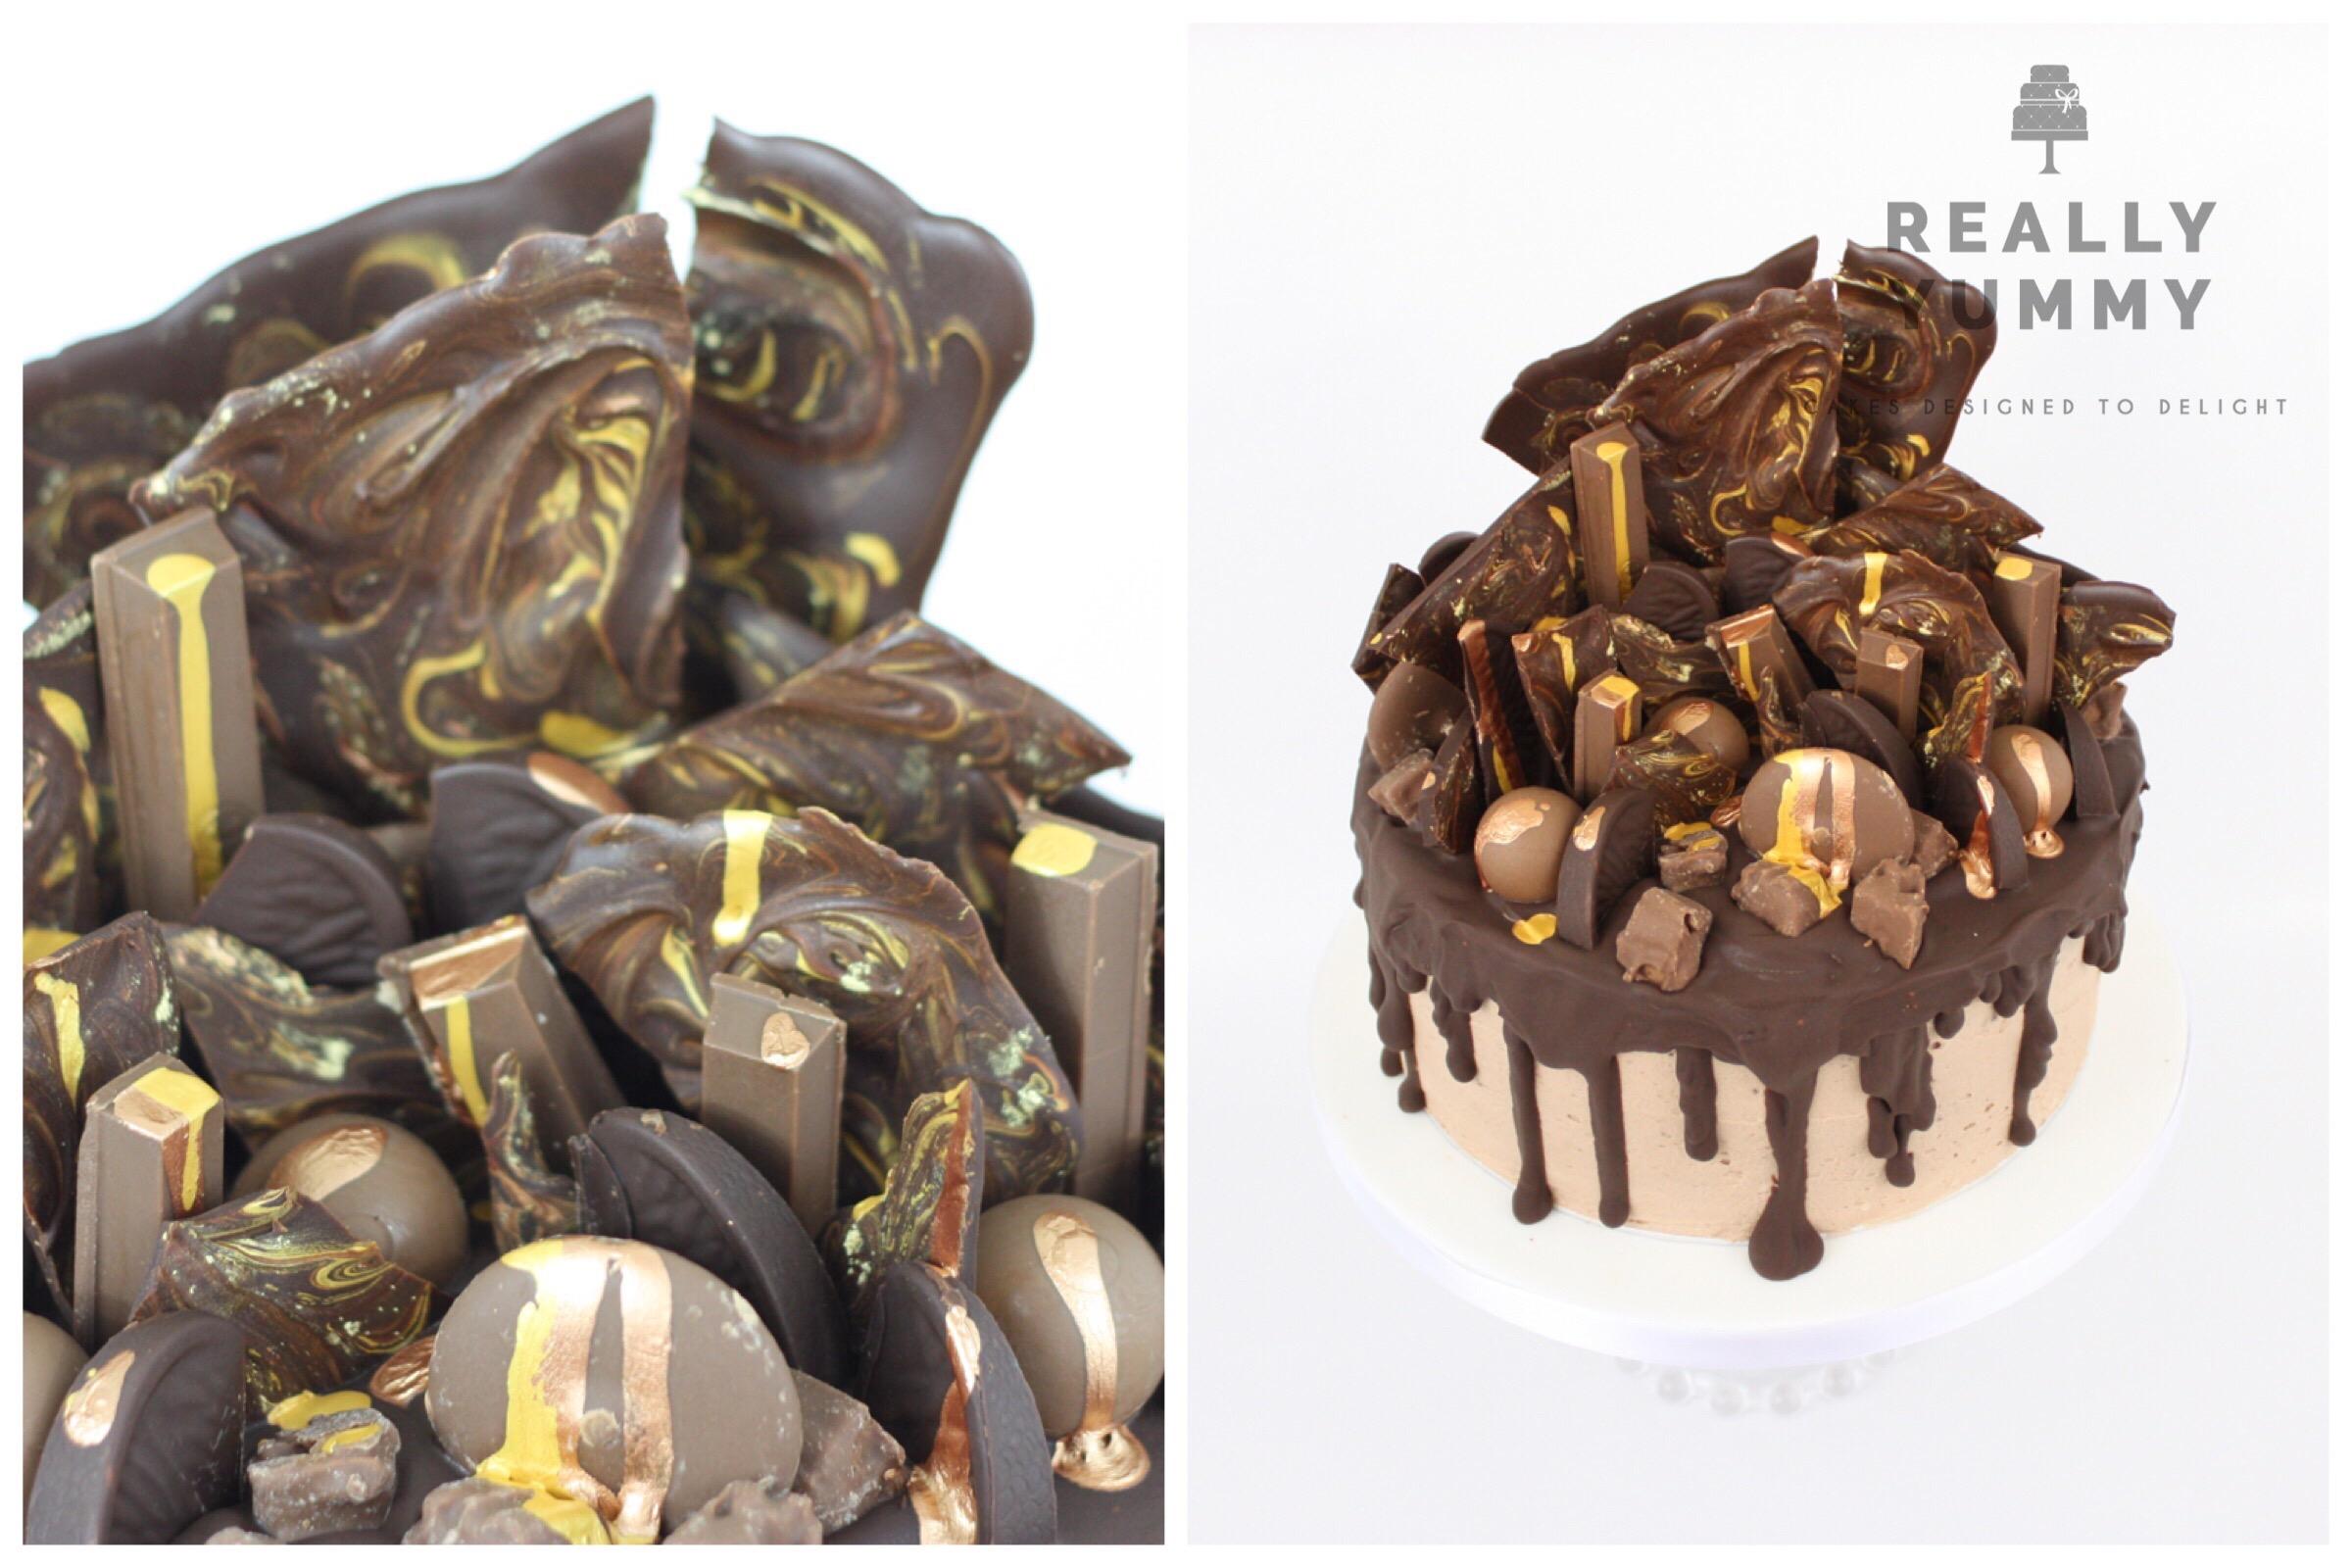 Chocolate and chocolate cake